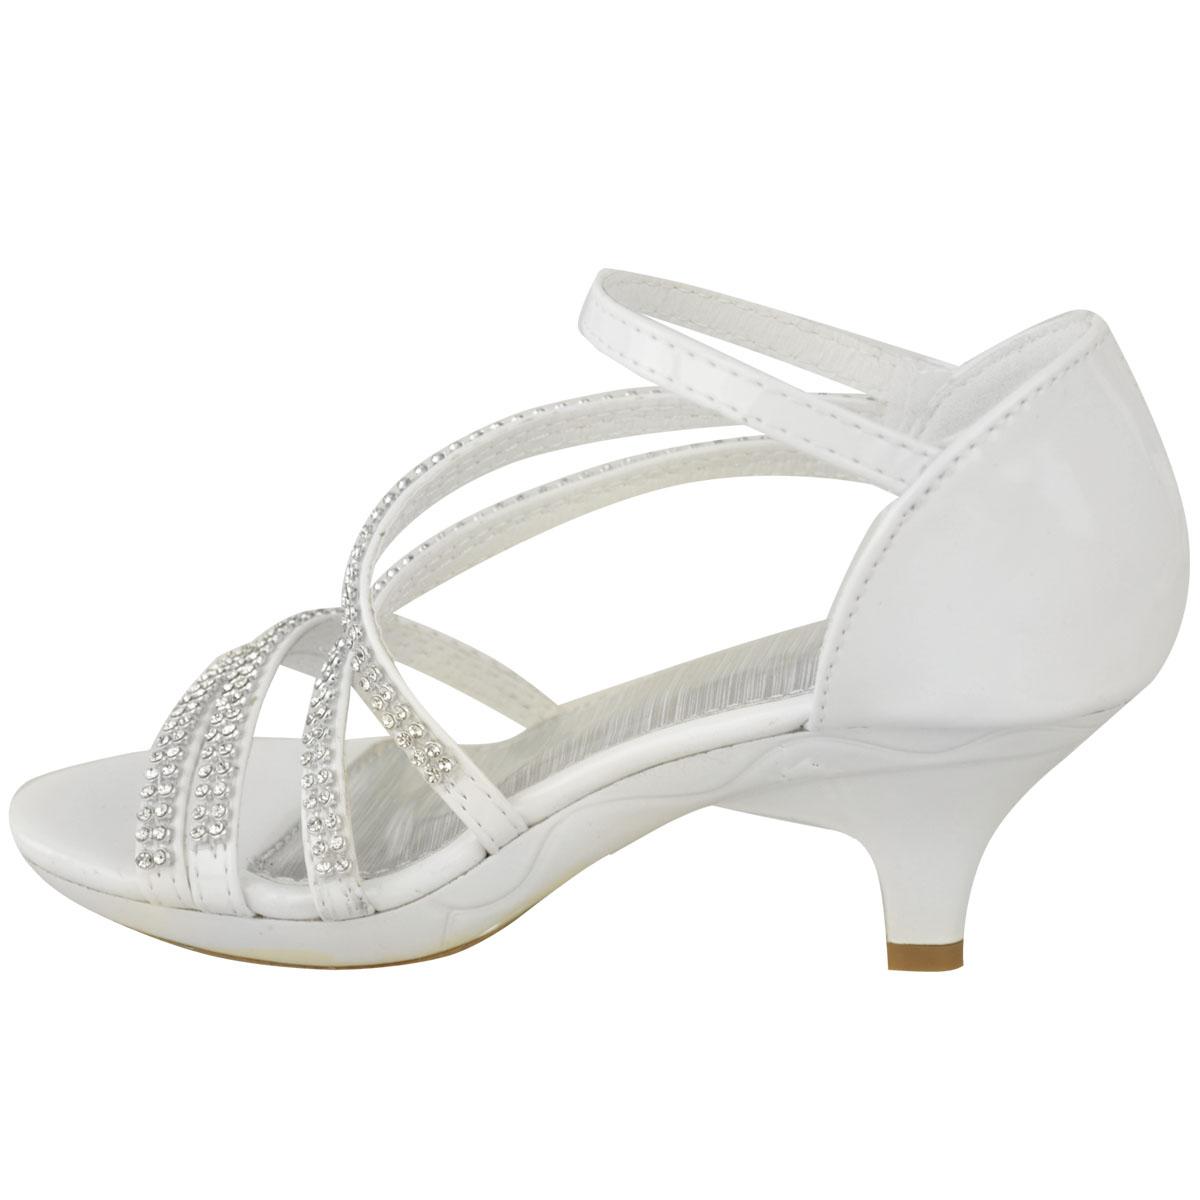 New Womens Ladies Girls Low Heel Bridal Wedding Sandal